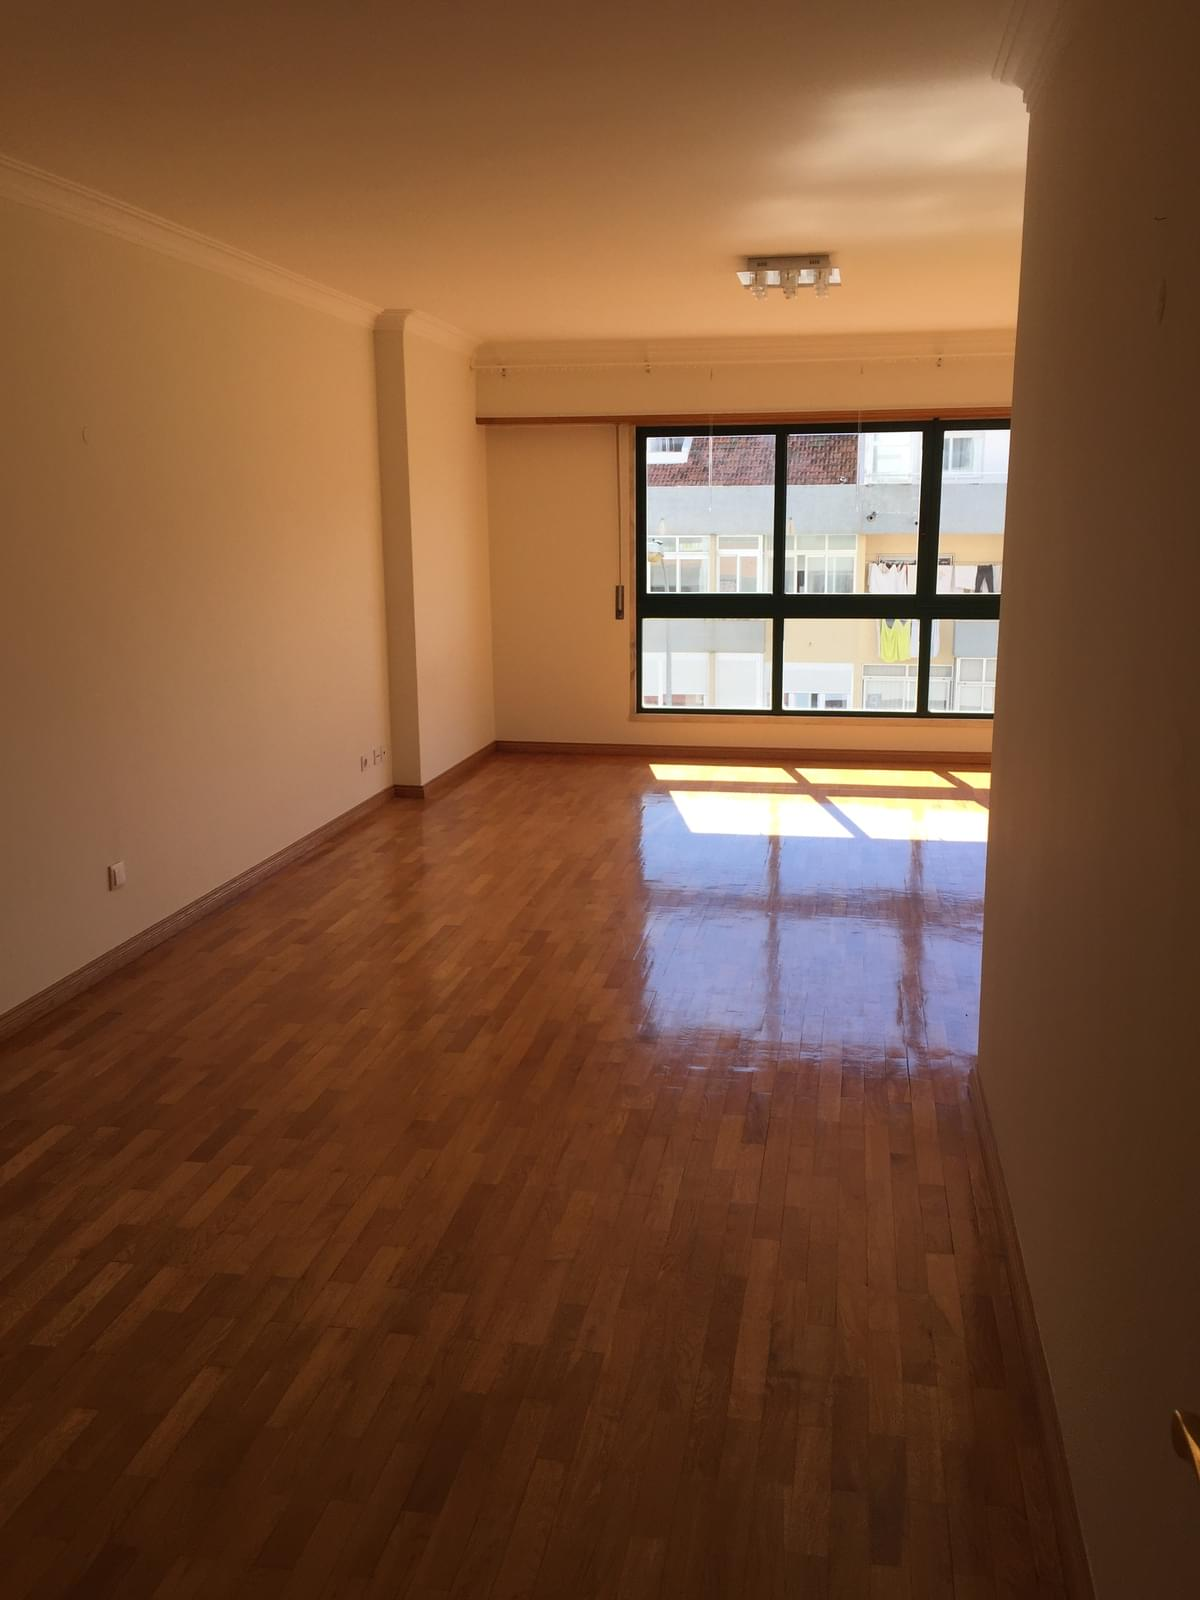 pf18344-apartamento-t3-oeiras-3b64e6d4-c8f7-46f0-b8e9-37a1a8772654